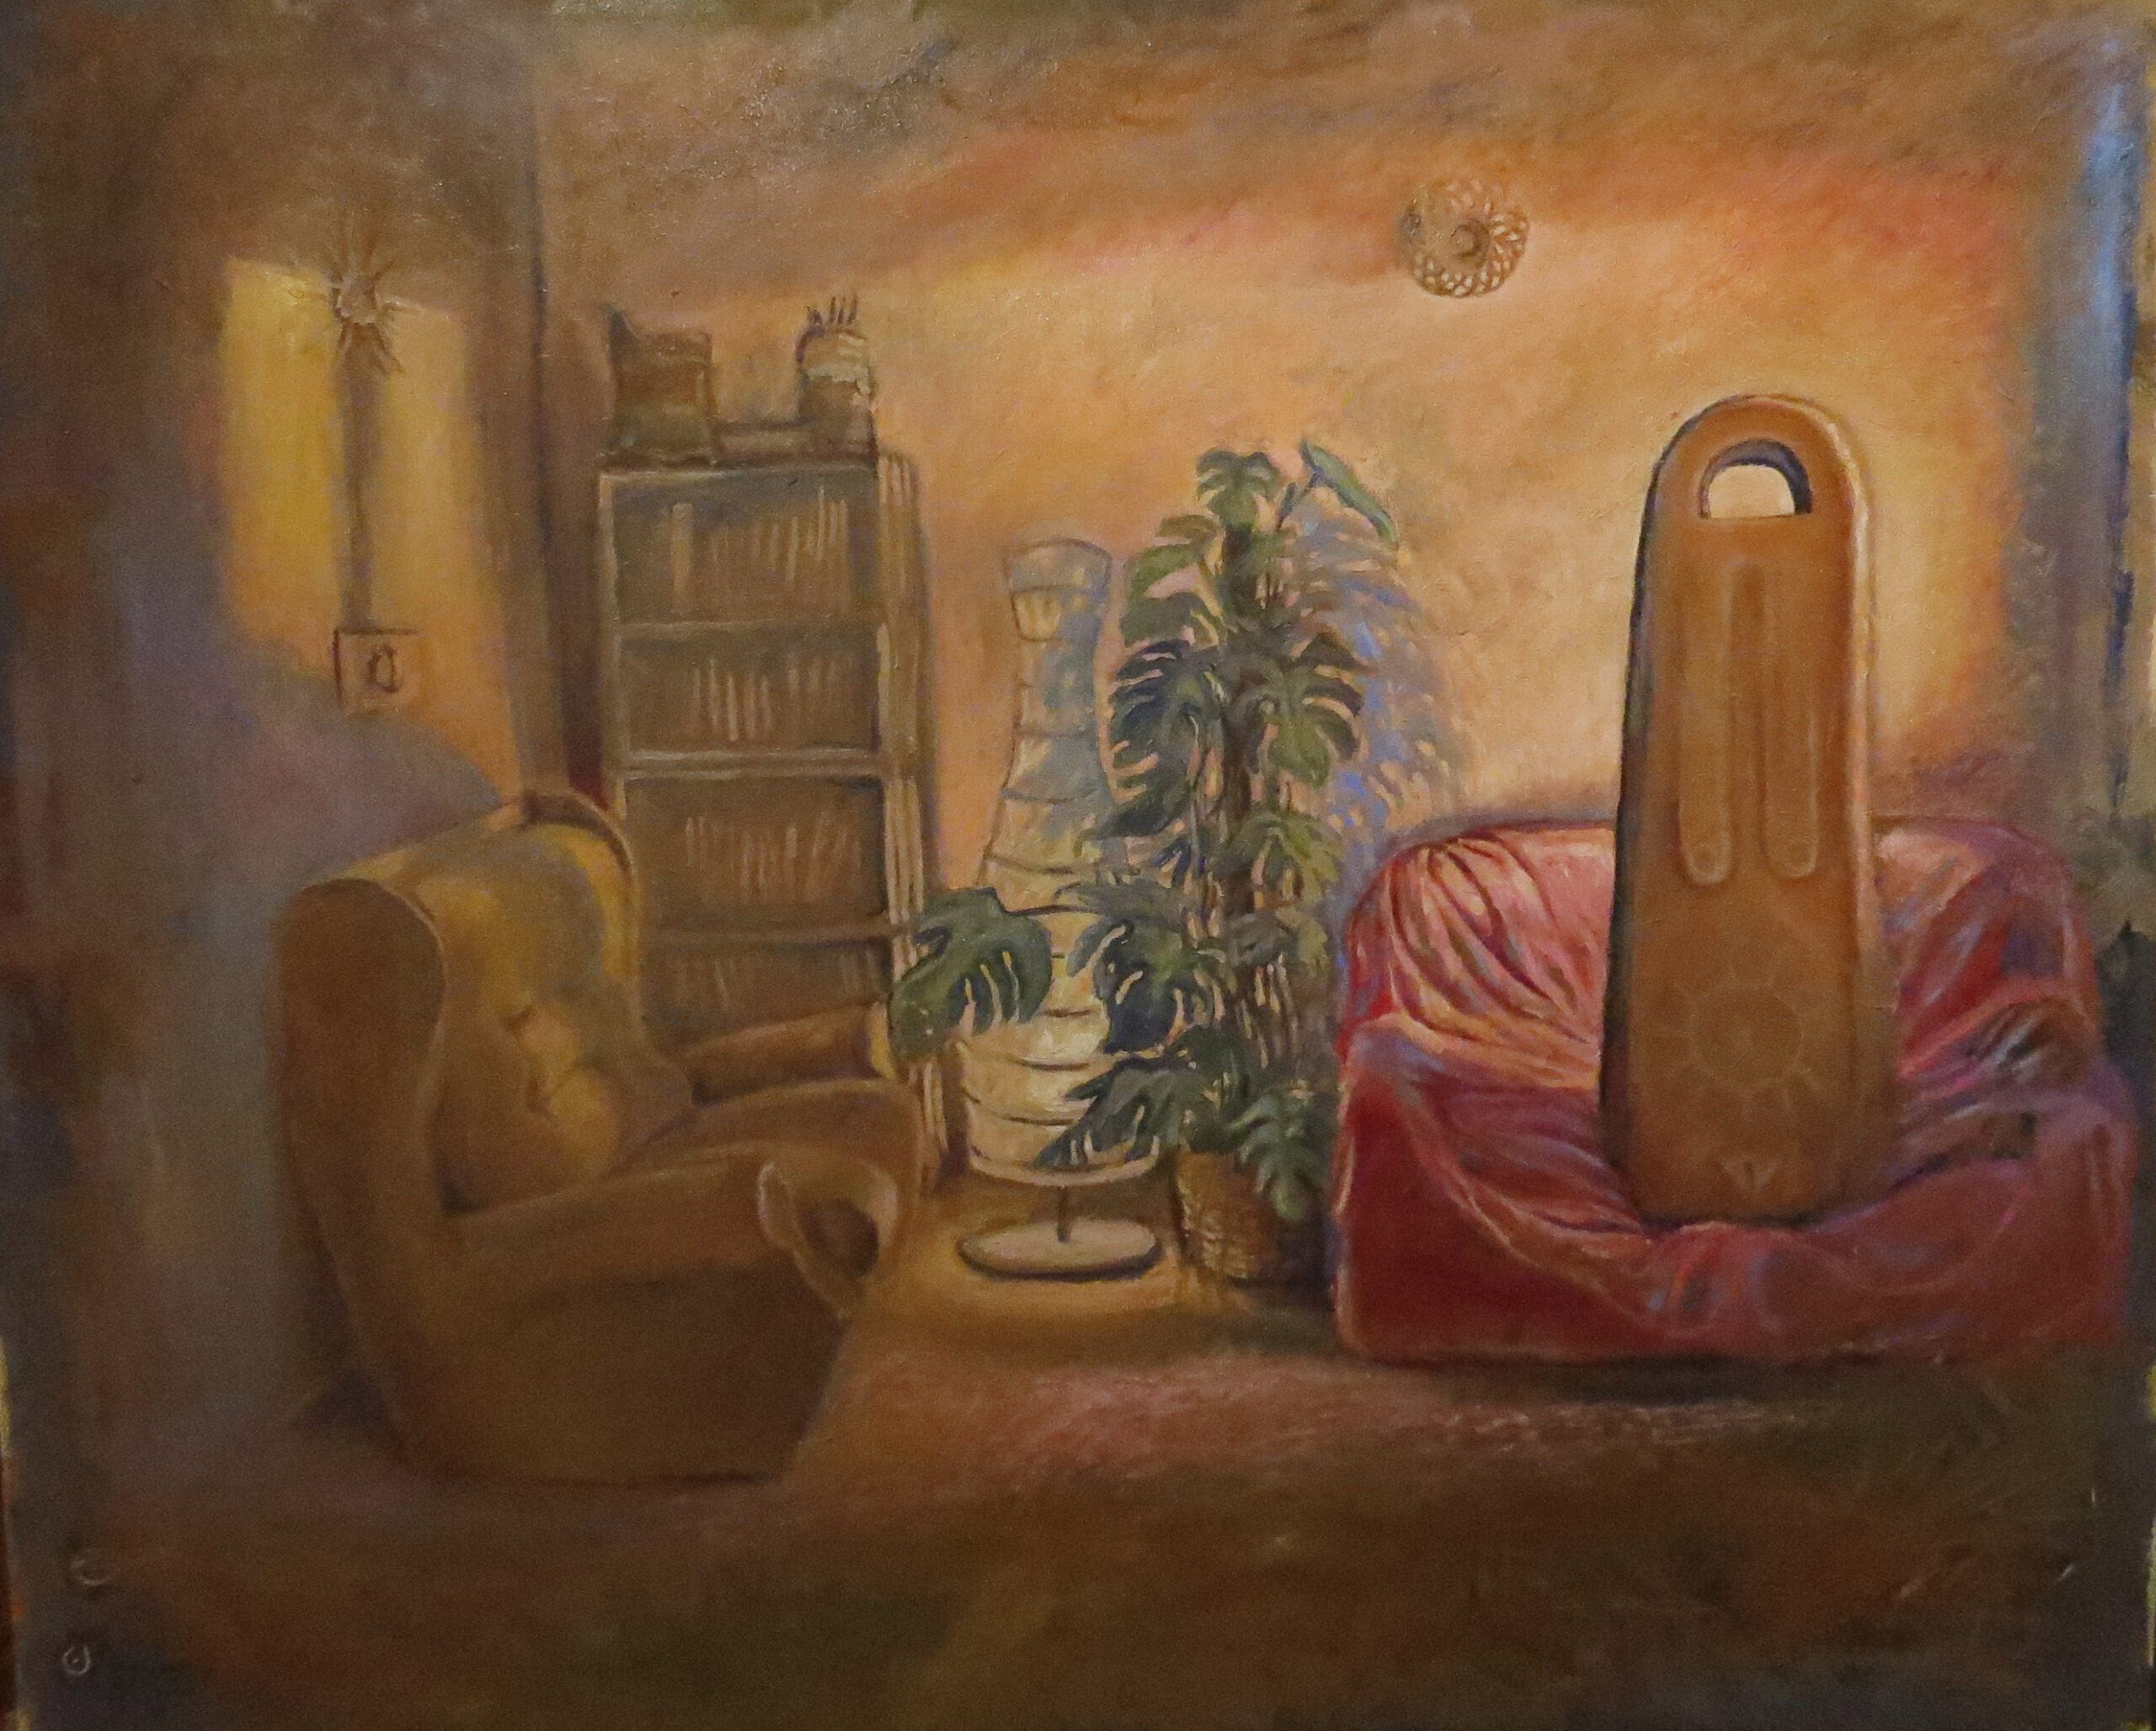 dipinto bacco Bartolini Ravenna 2021